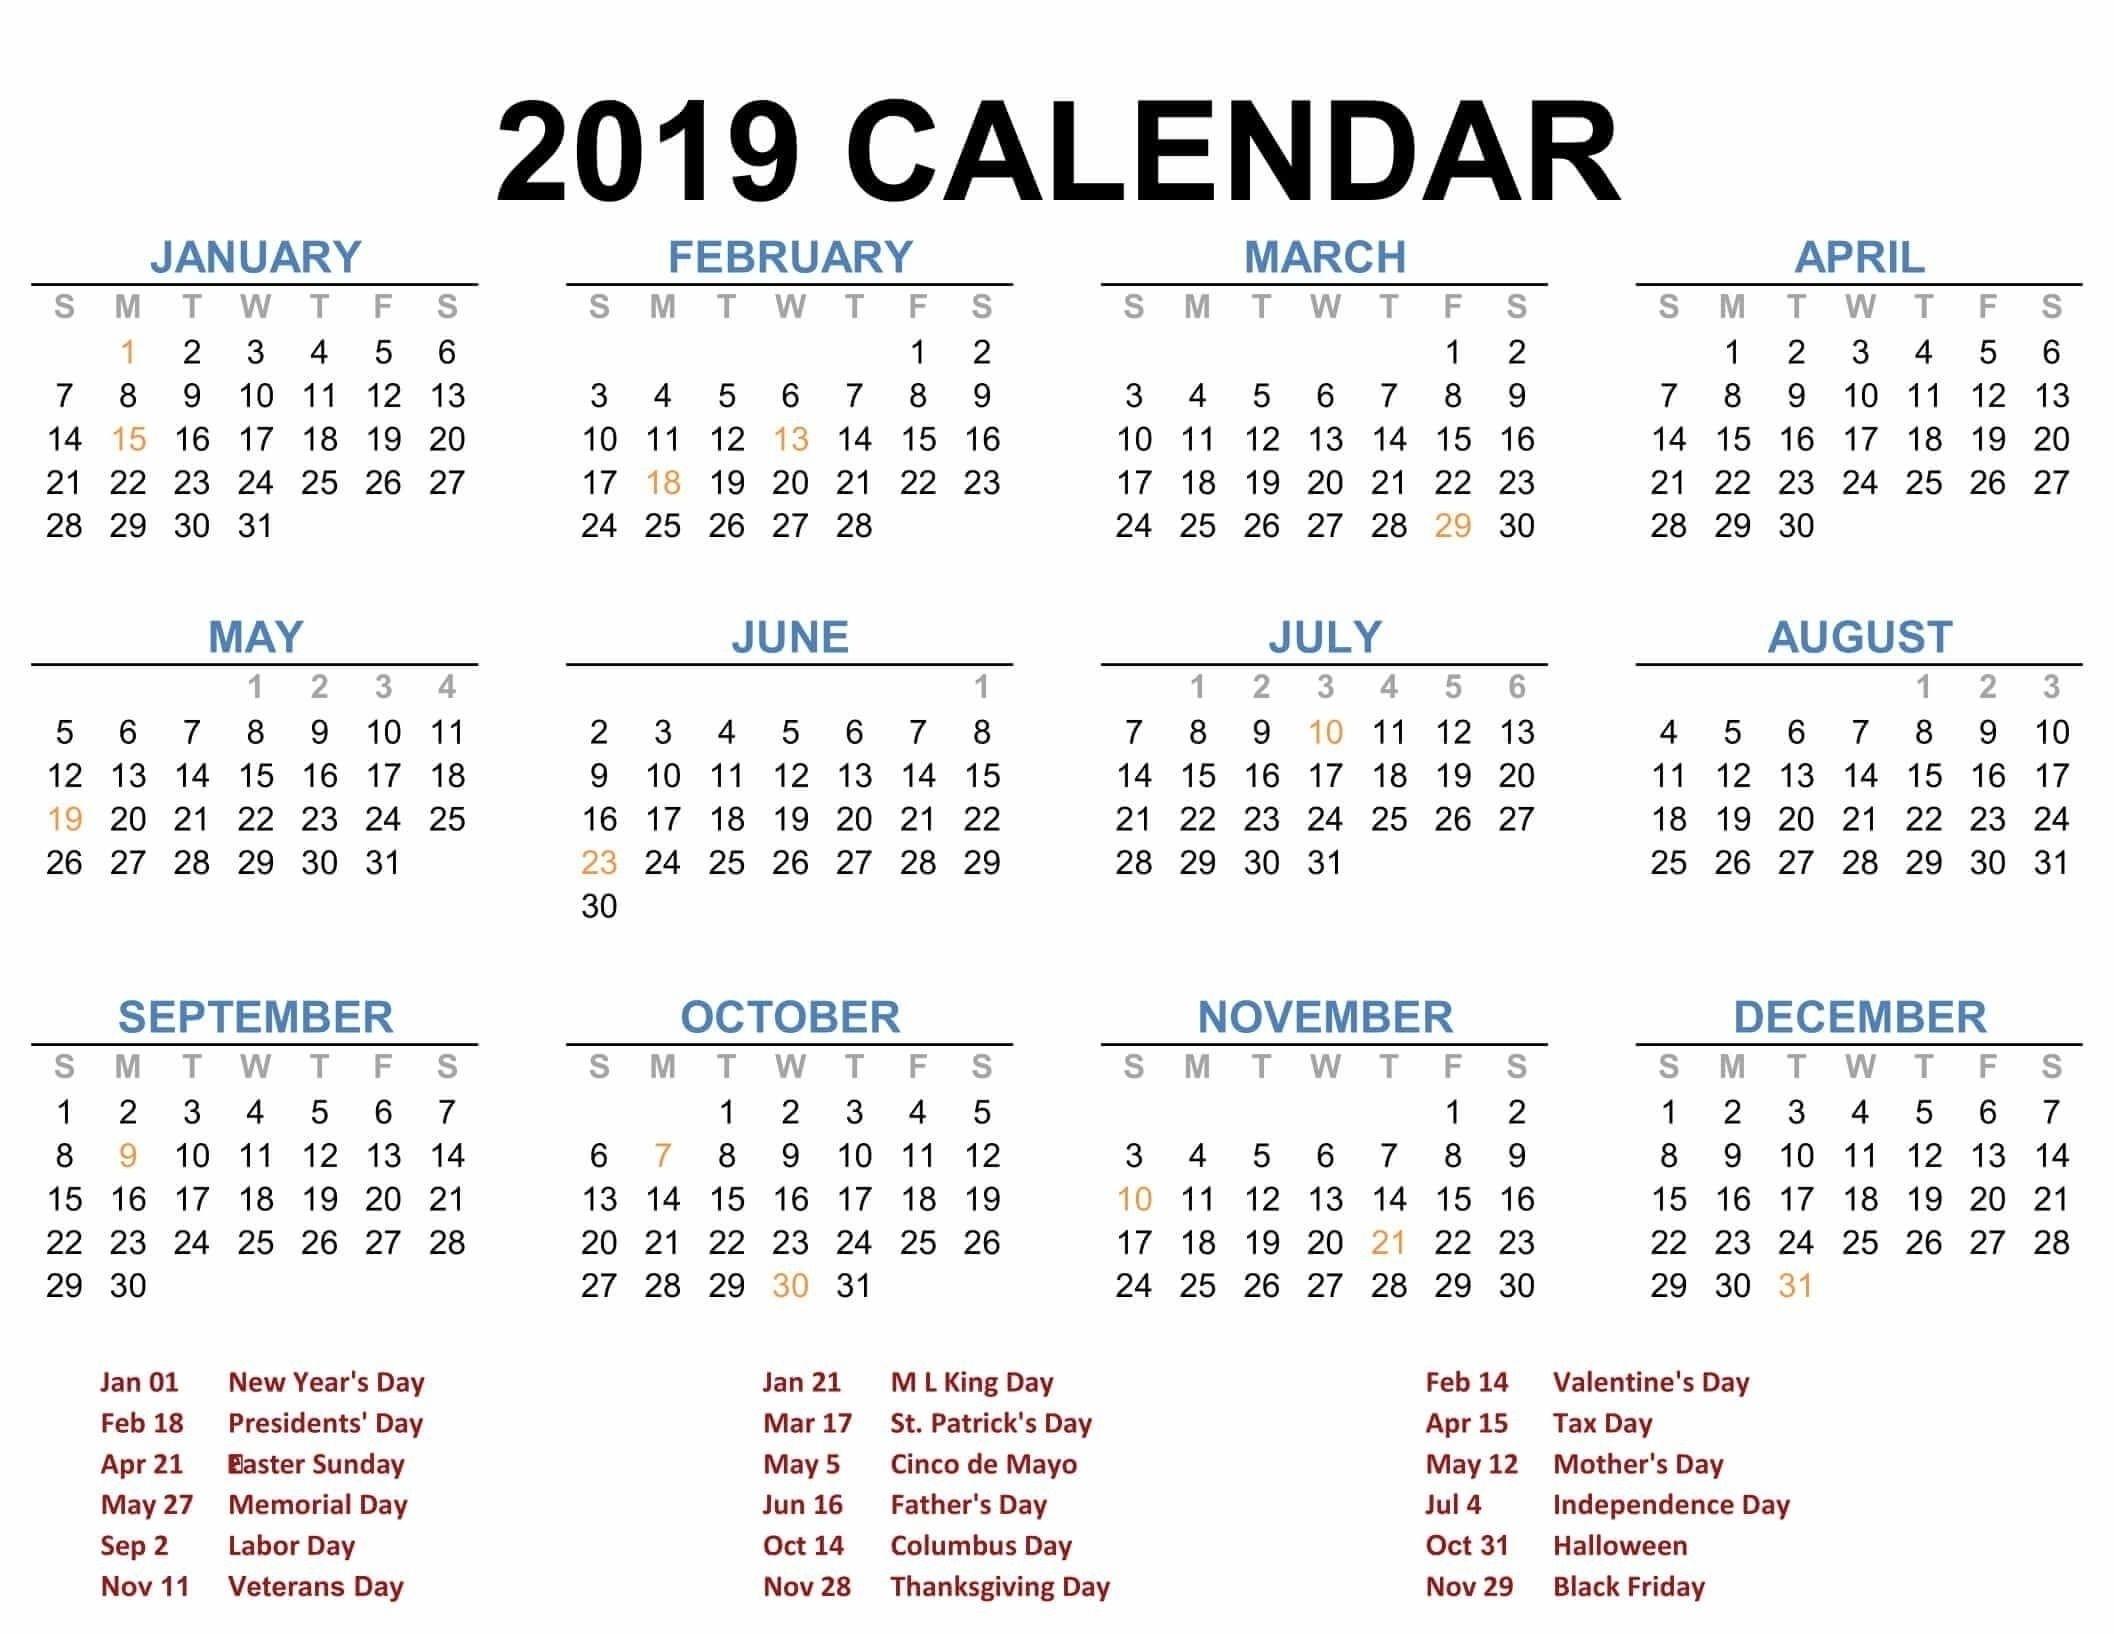 2019 Yearly Calendar Printable 8X11 August | Calendar Format